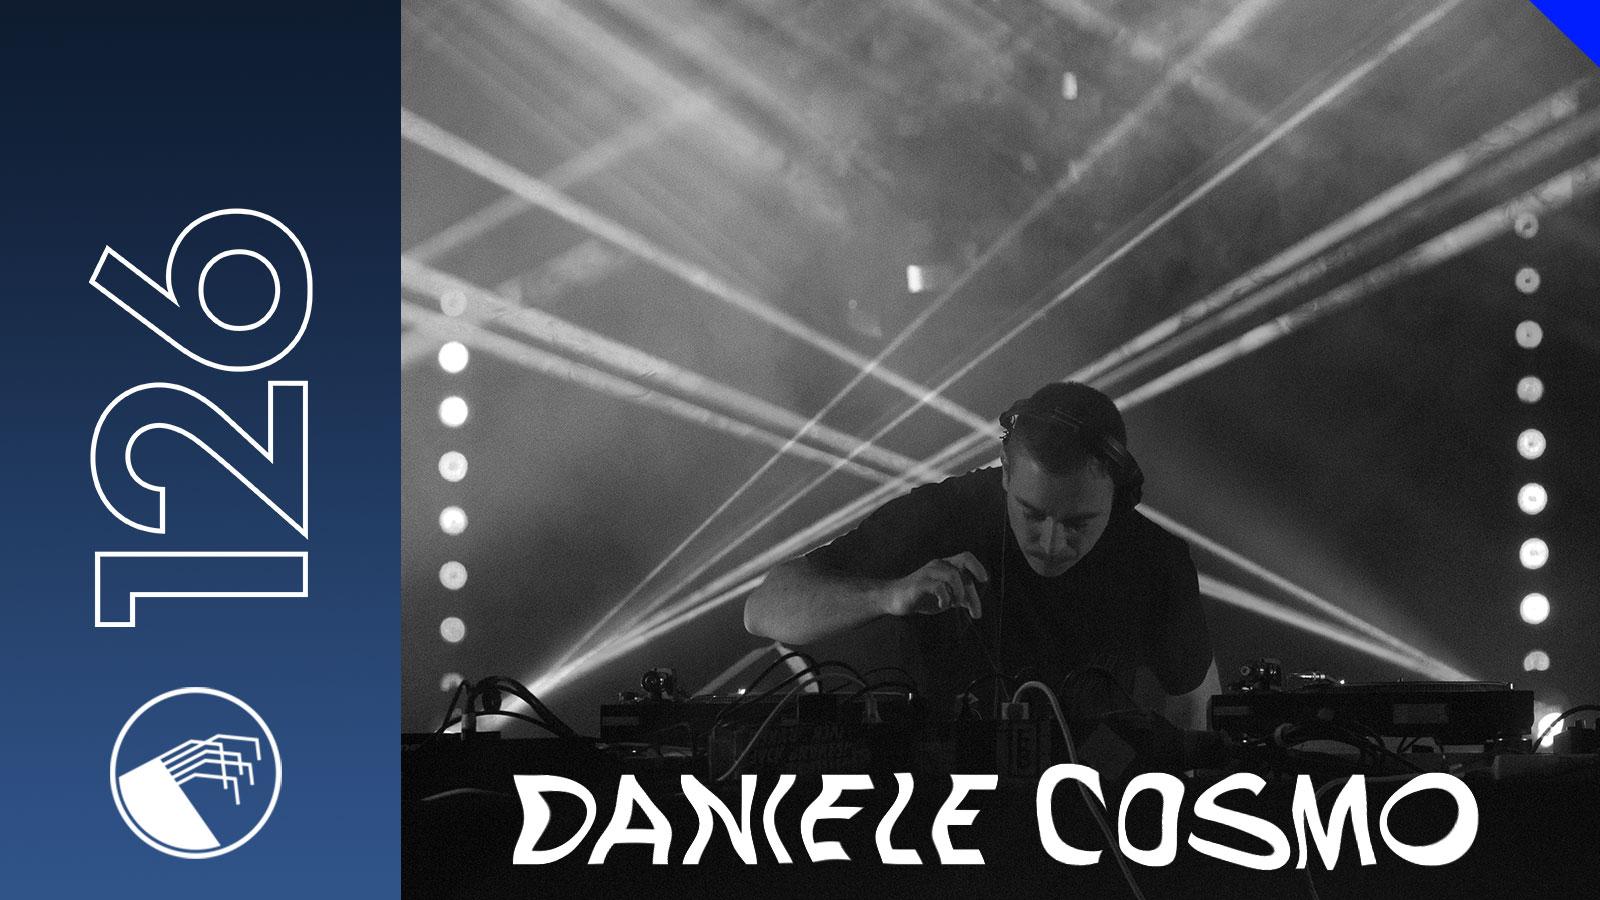 126 Daniele Cosmo